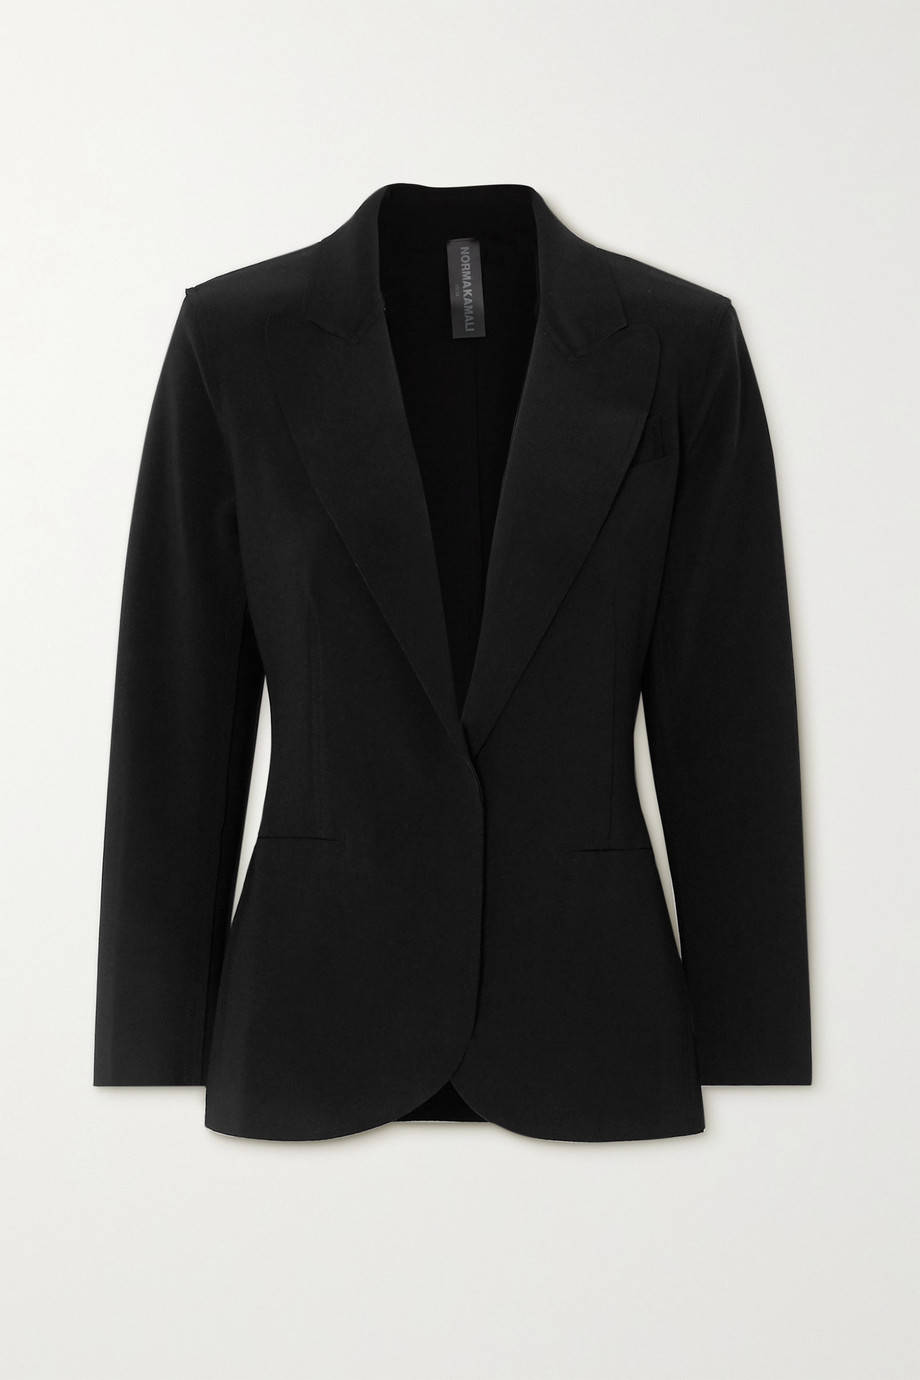 Norma Kamali 弹力平纹布西装外套